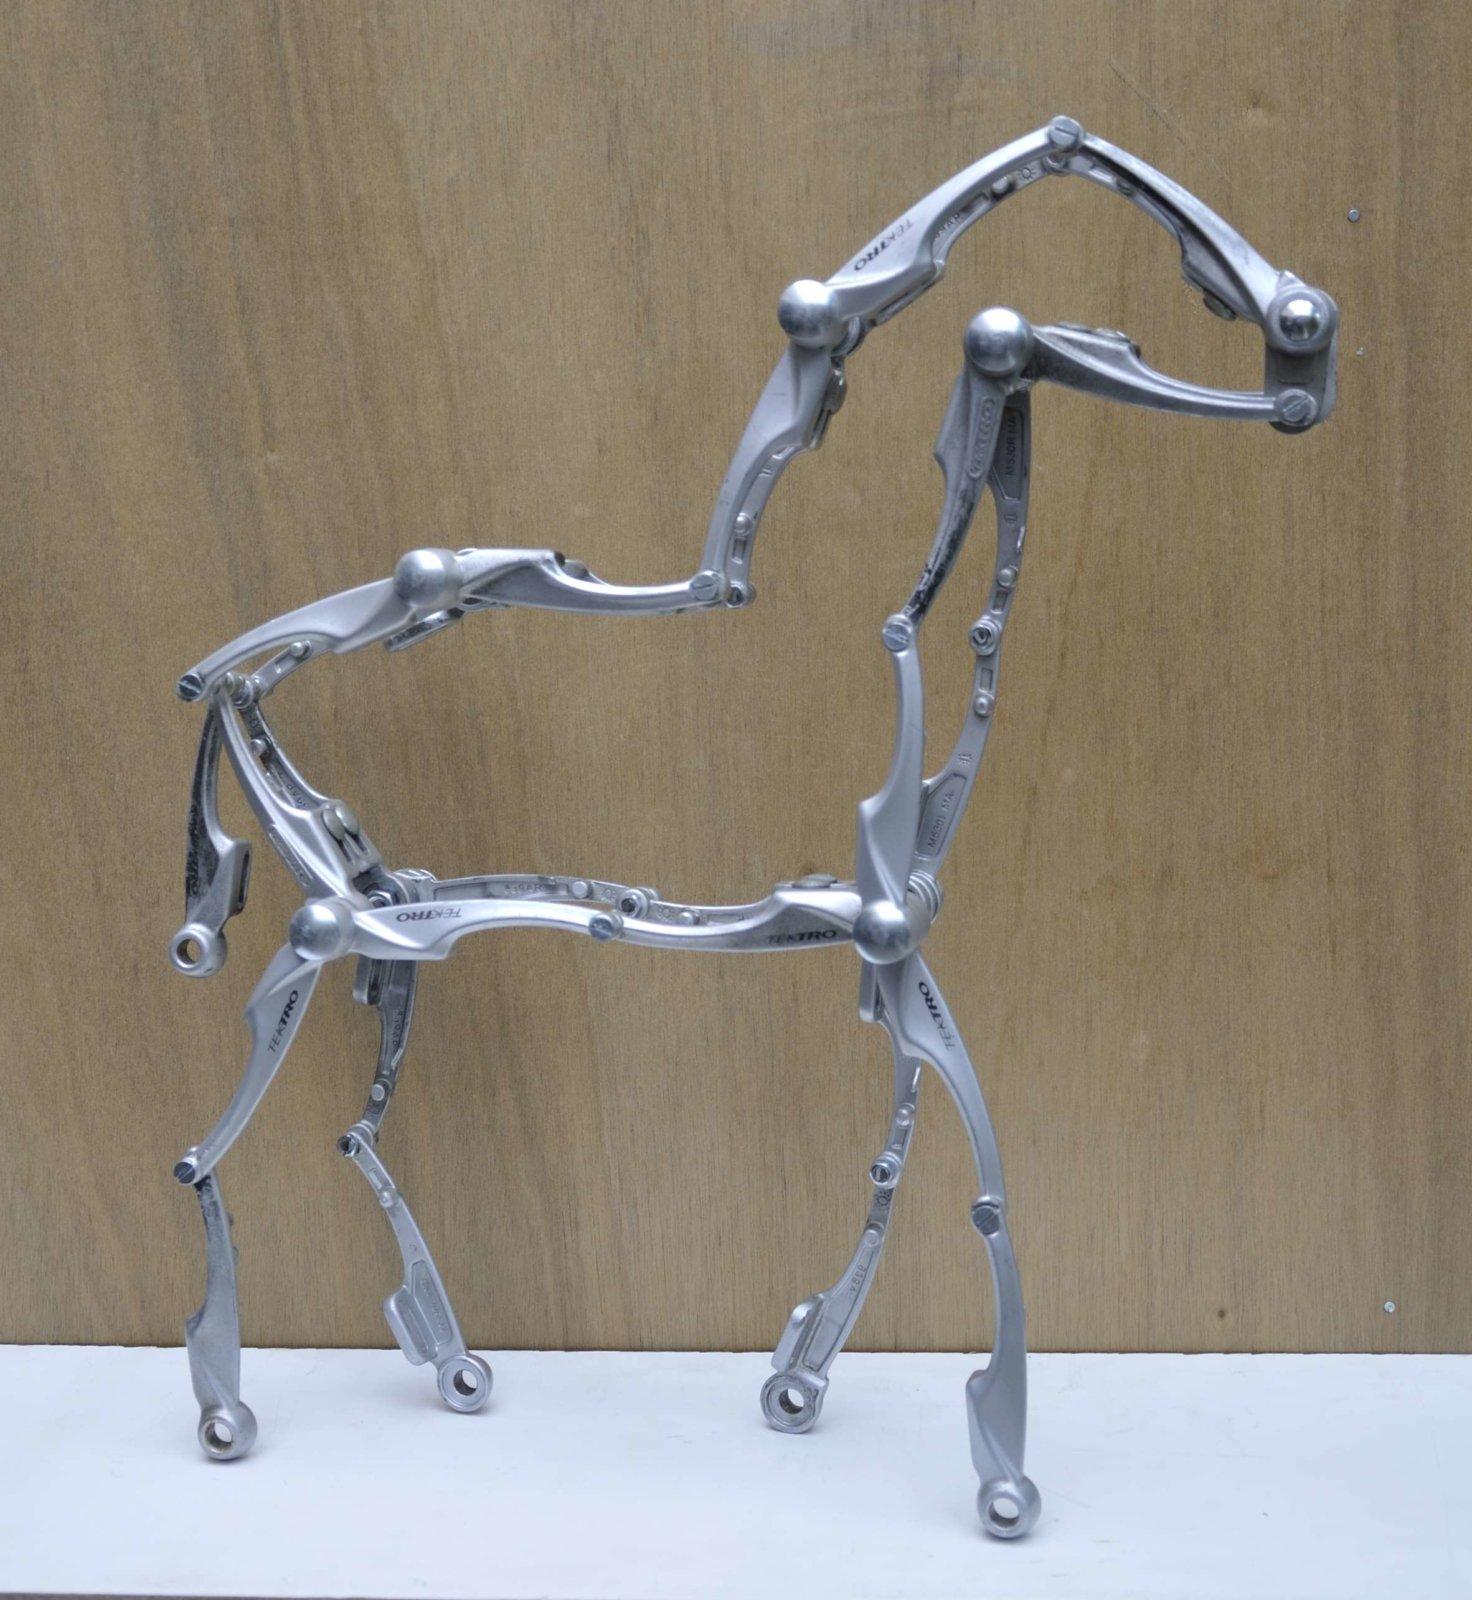 Paard Horse Pferd Cheval Cavallo Caballo Da Vinci Decreatievelink Fietskunst